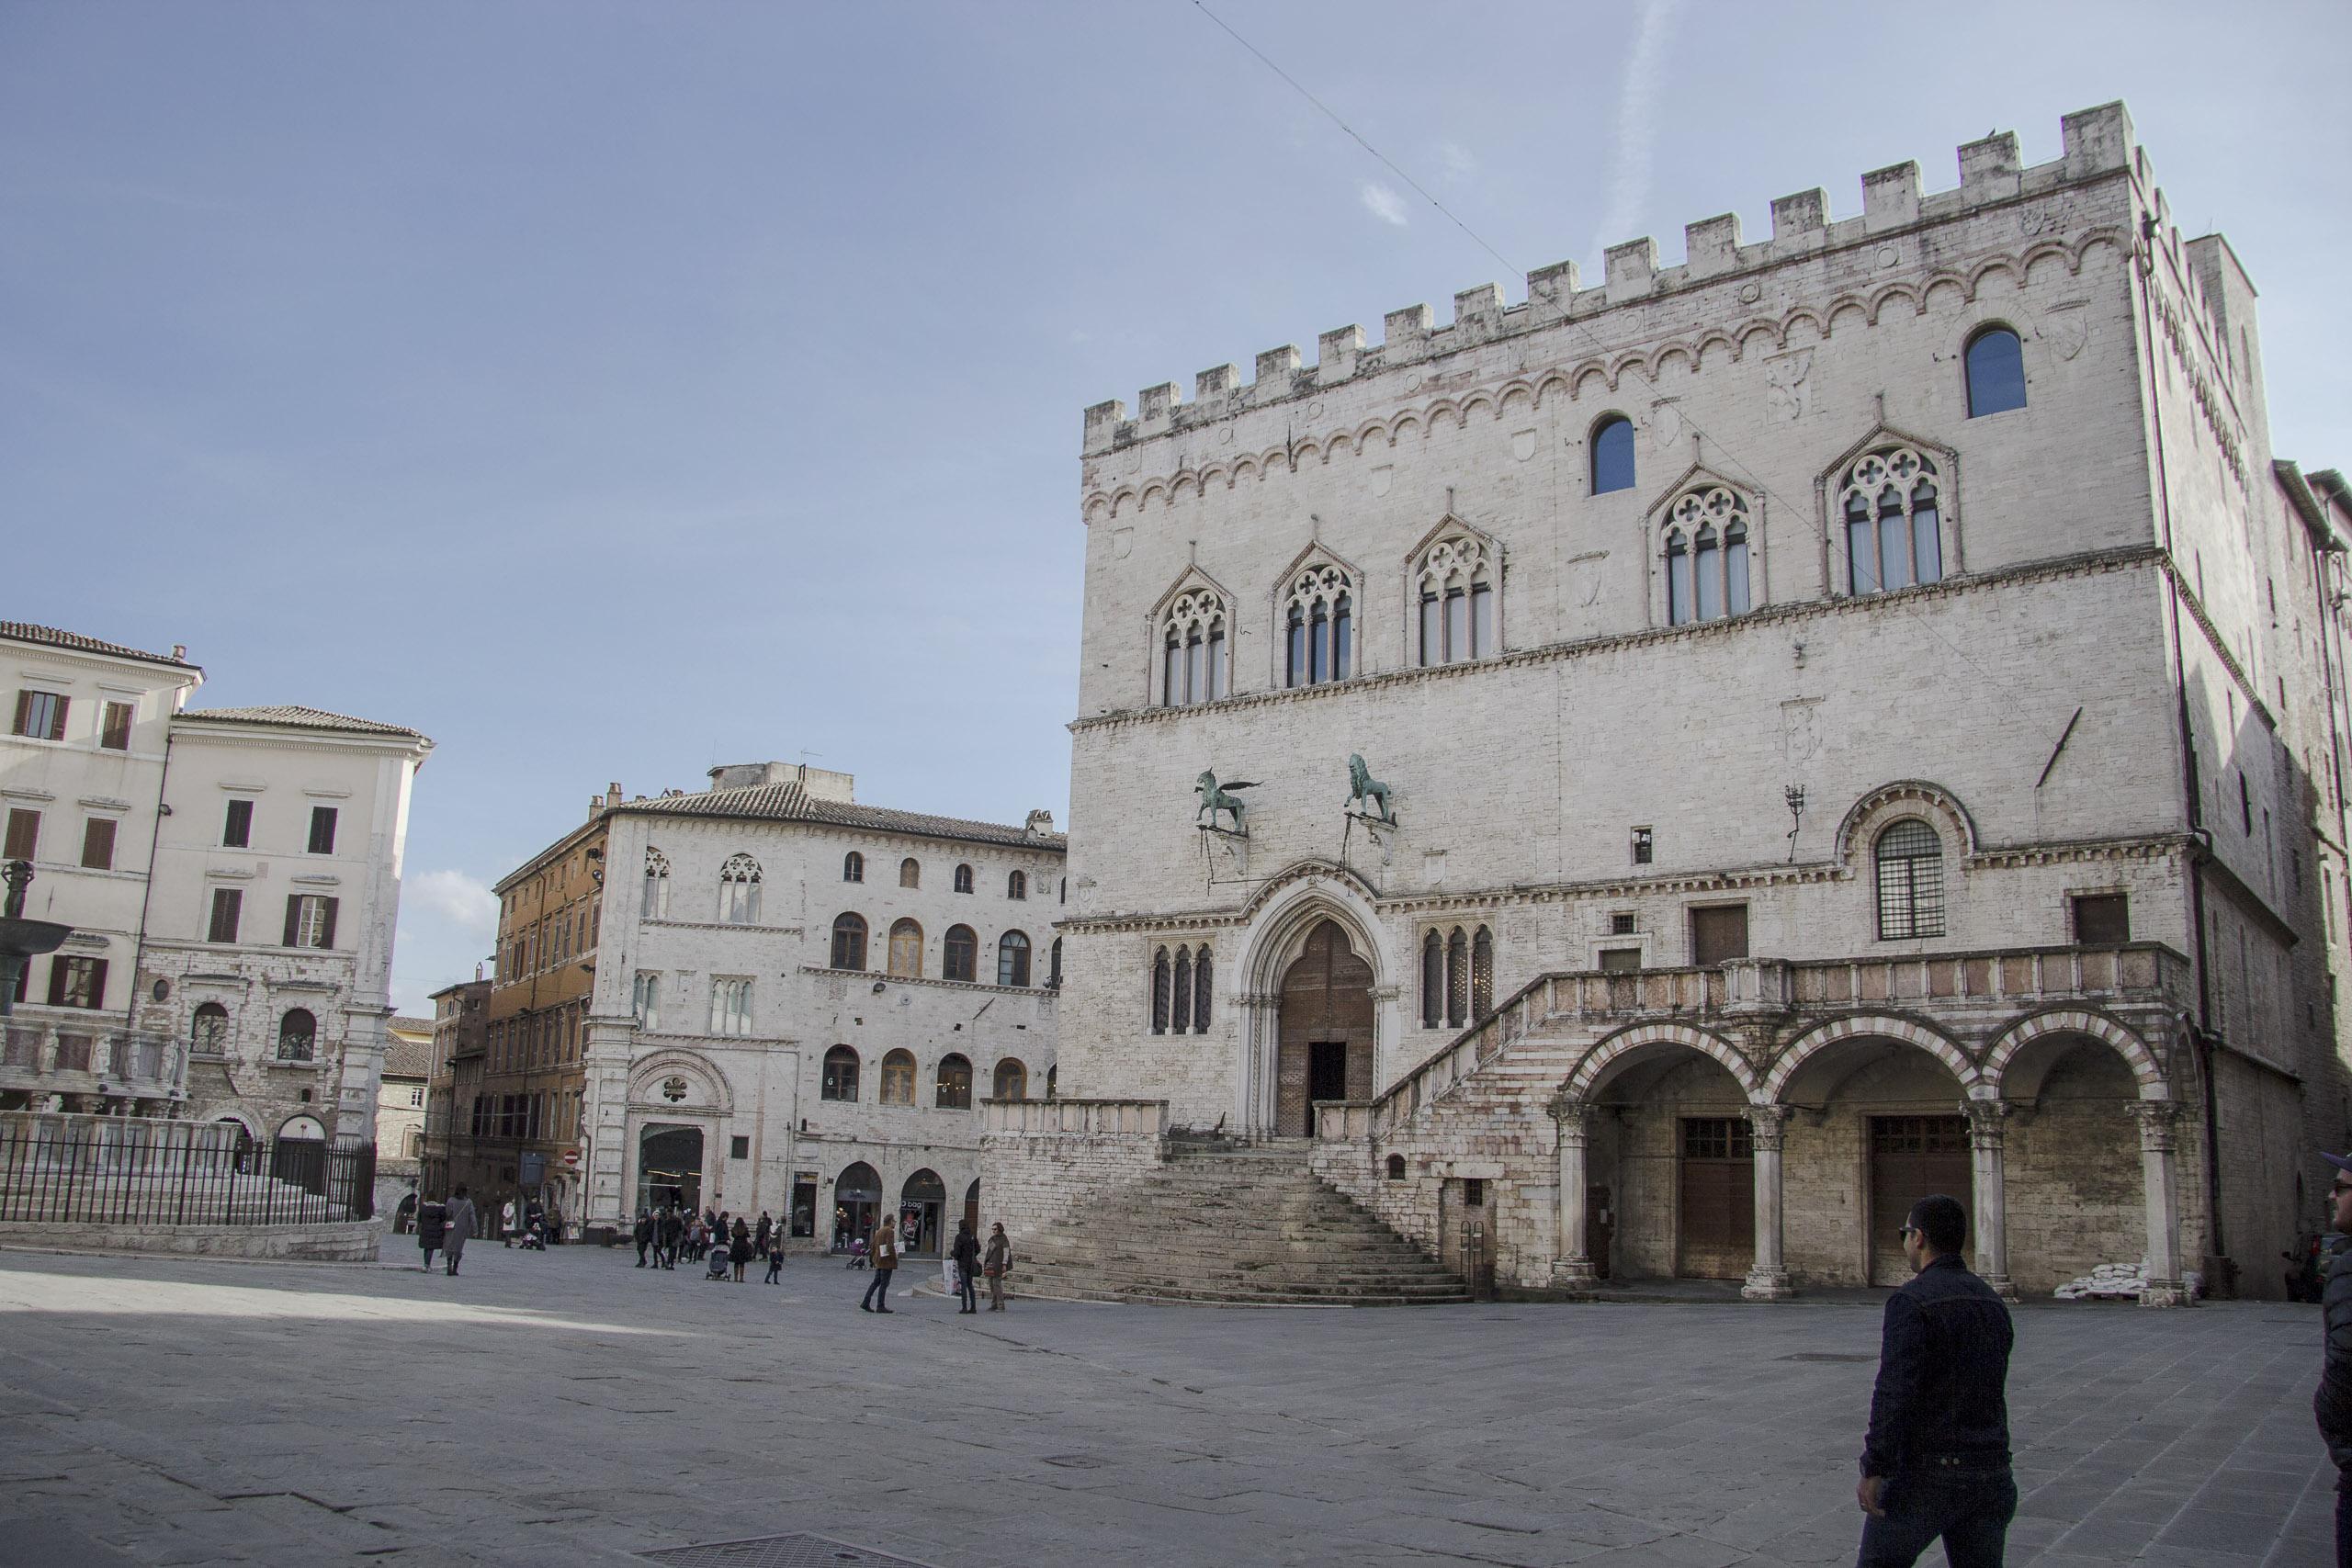 B&B Le Naiadi - Perugia Centro Storico